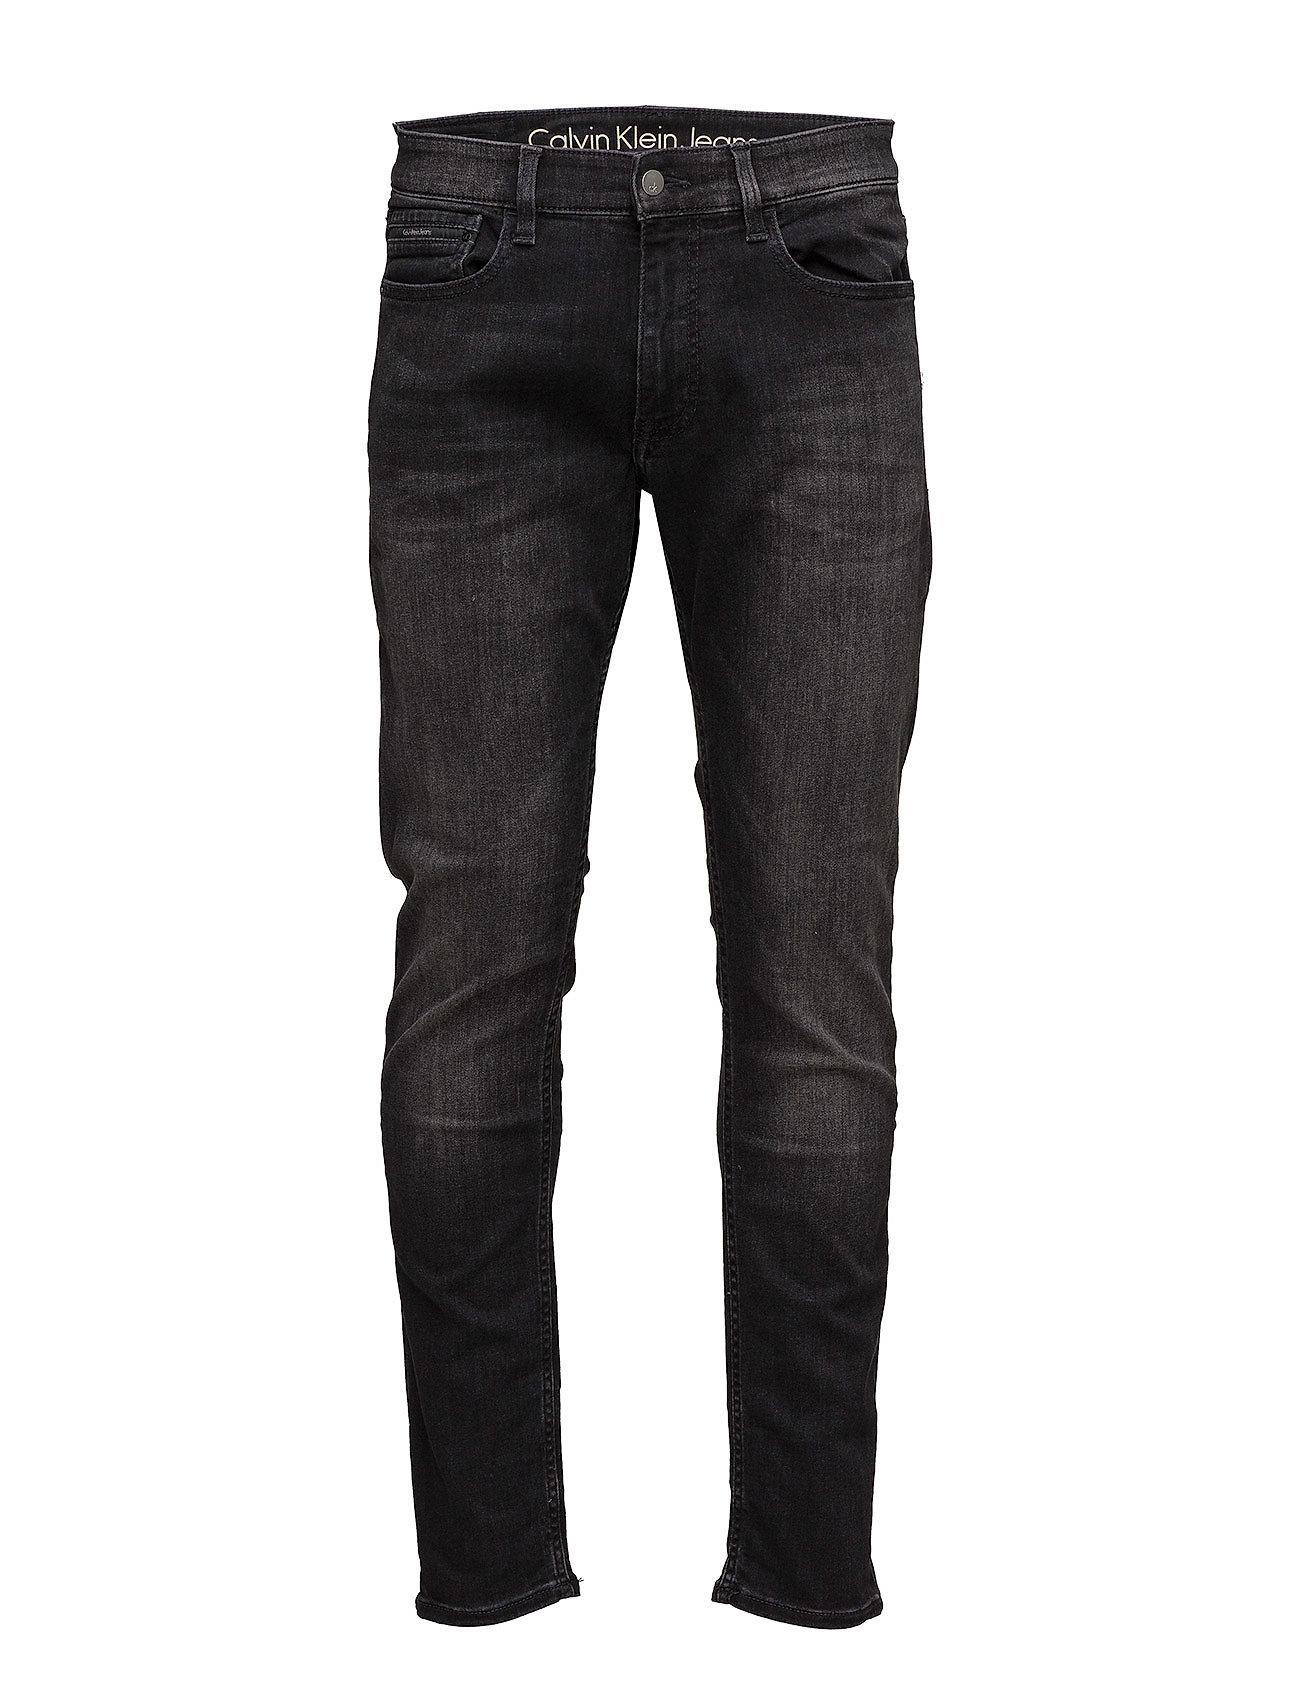 calvin klein jeans – Skinny - black widow på boozt.com dk